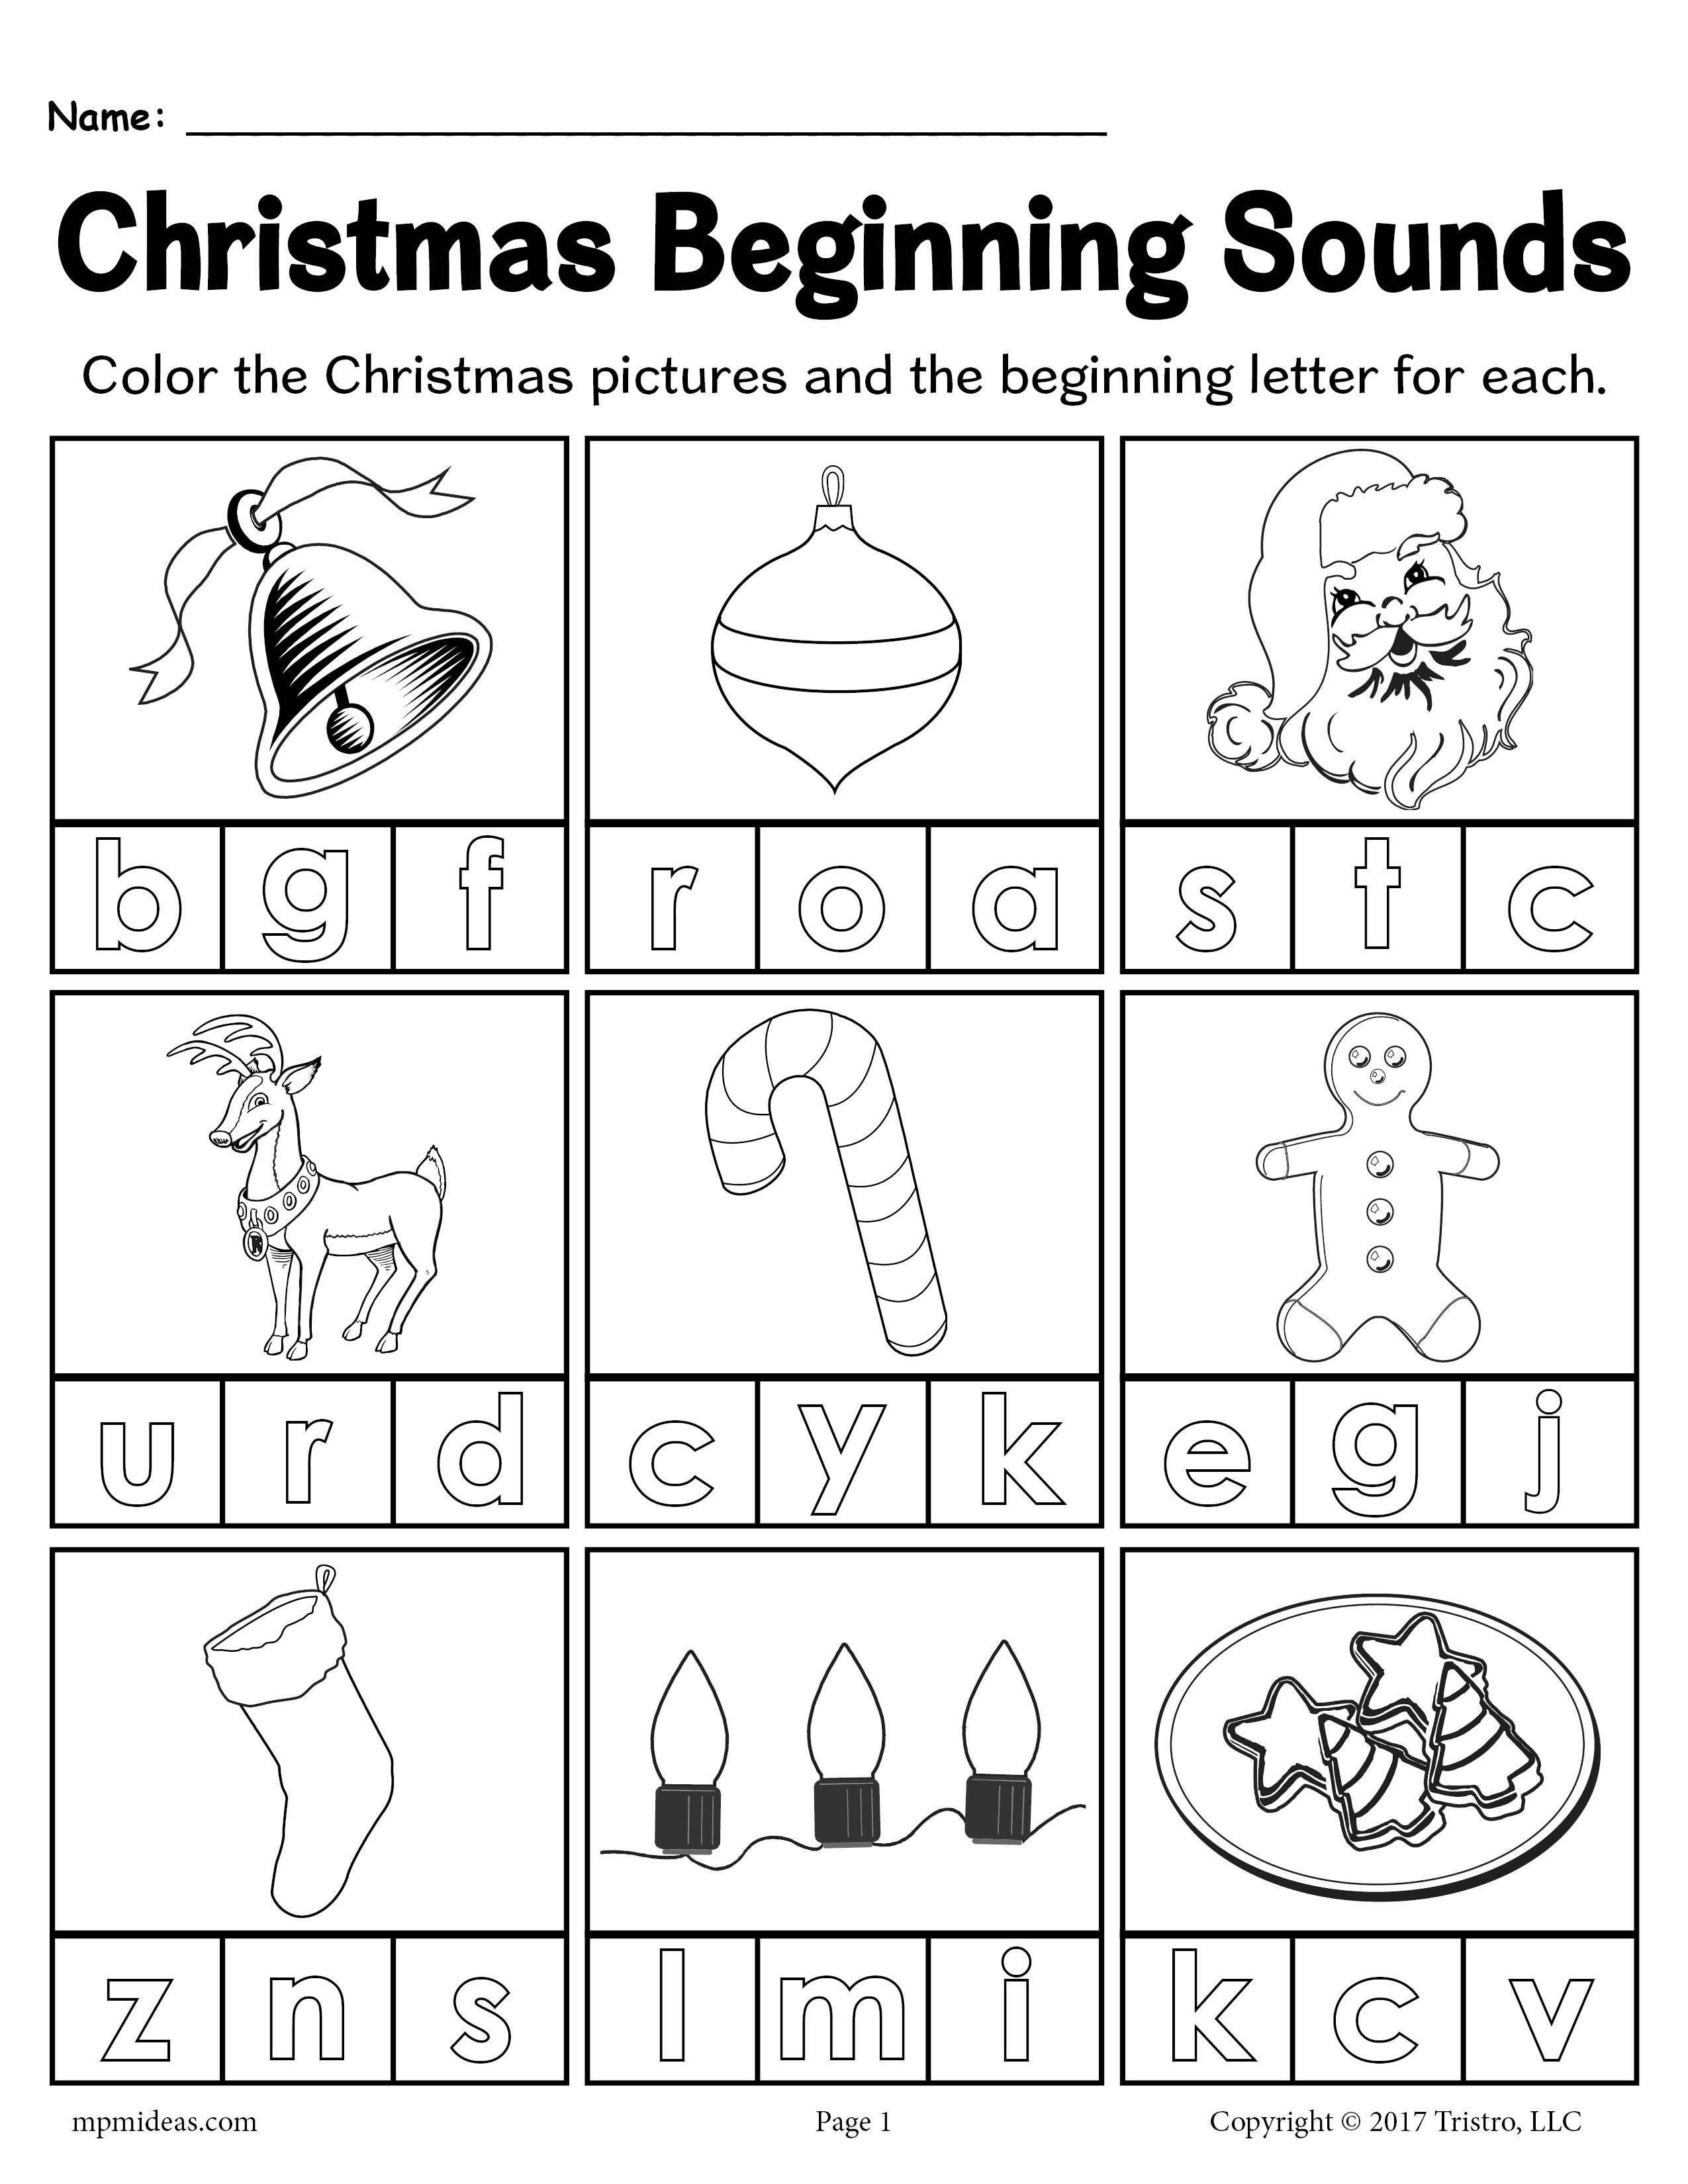 Printable Christmas Beginning Sounds Worksheet Beginning Sounds Worksheets Free Kindergarten Worksheets Christmas Worksheets